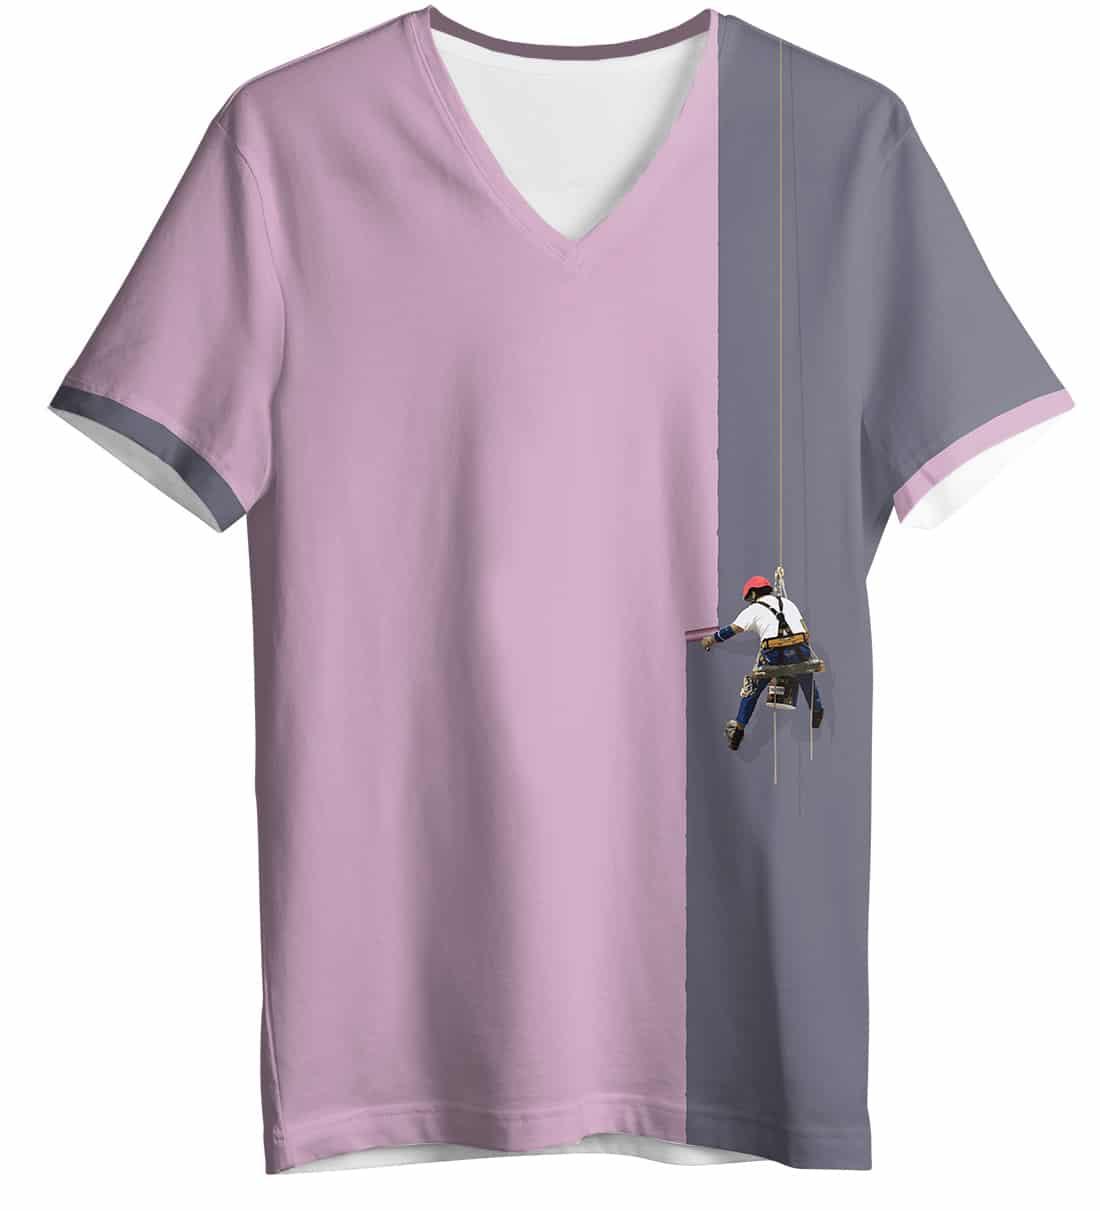 Creative painter t shirt women 39 s short sleeve v neck for T shirt creative design